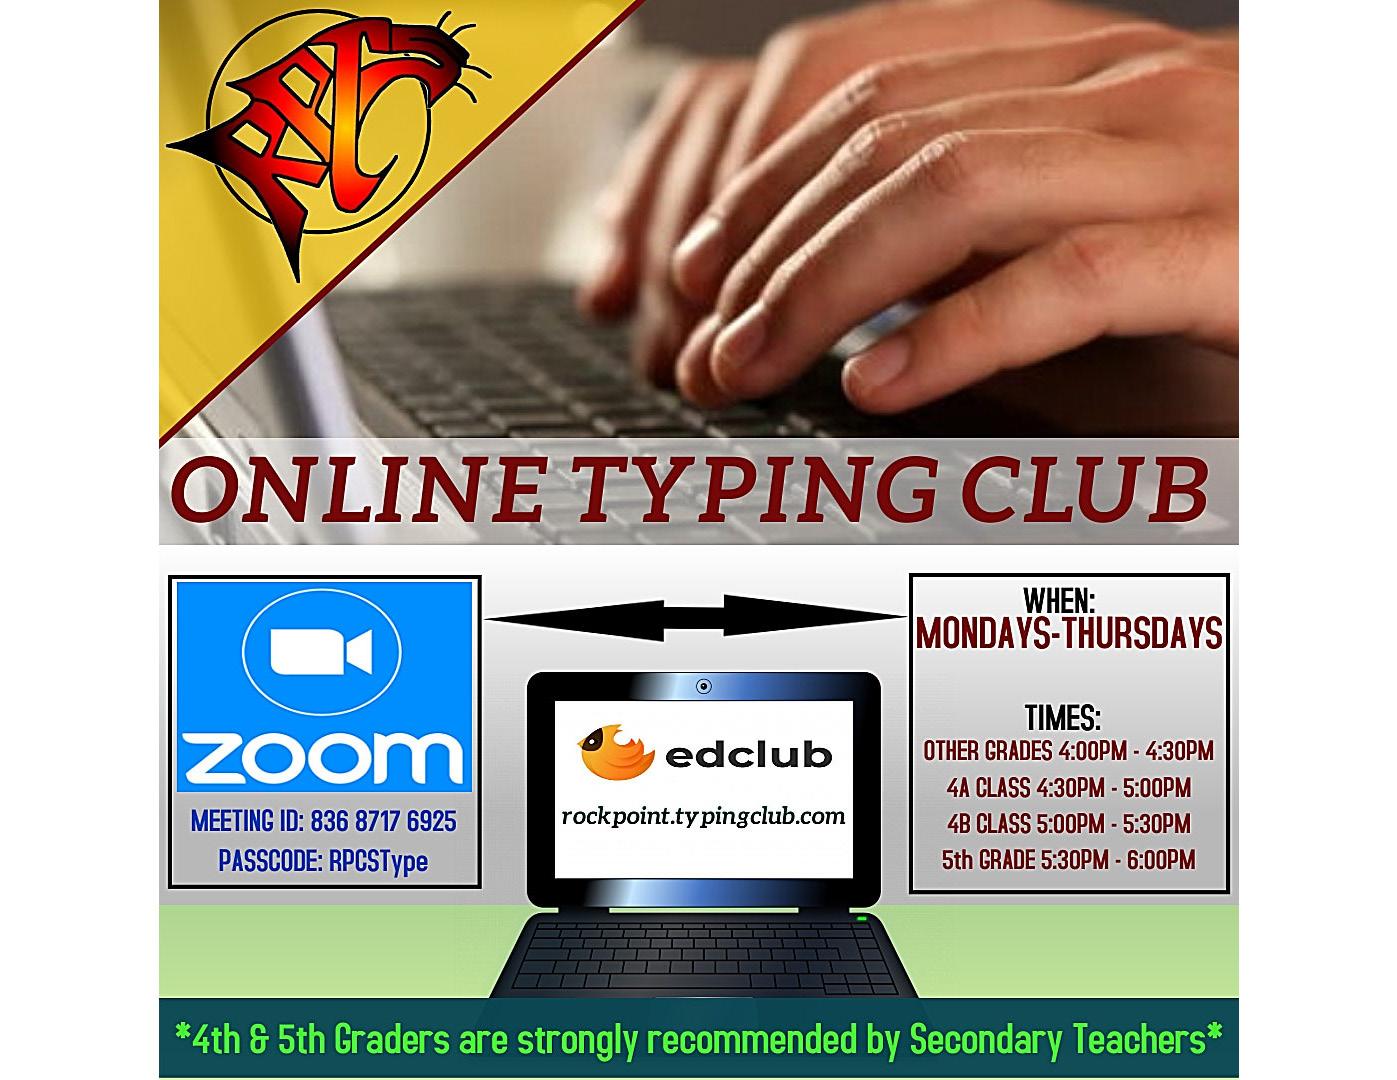 Afterschool Online Typing Club